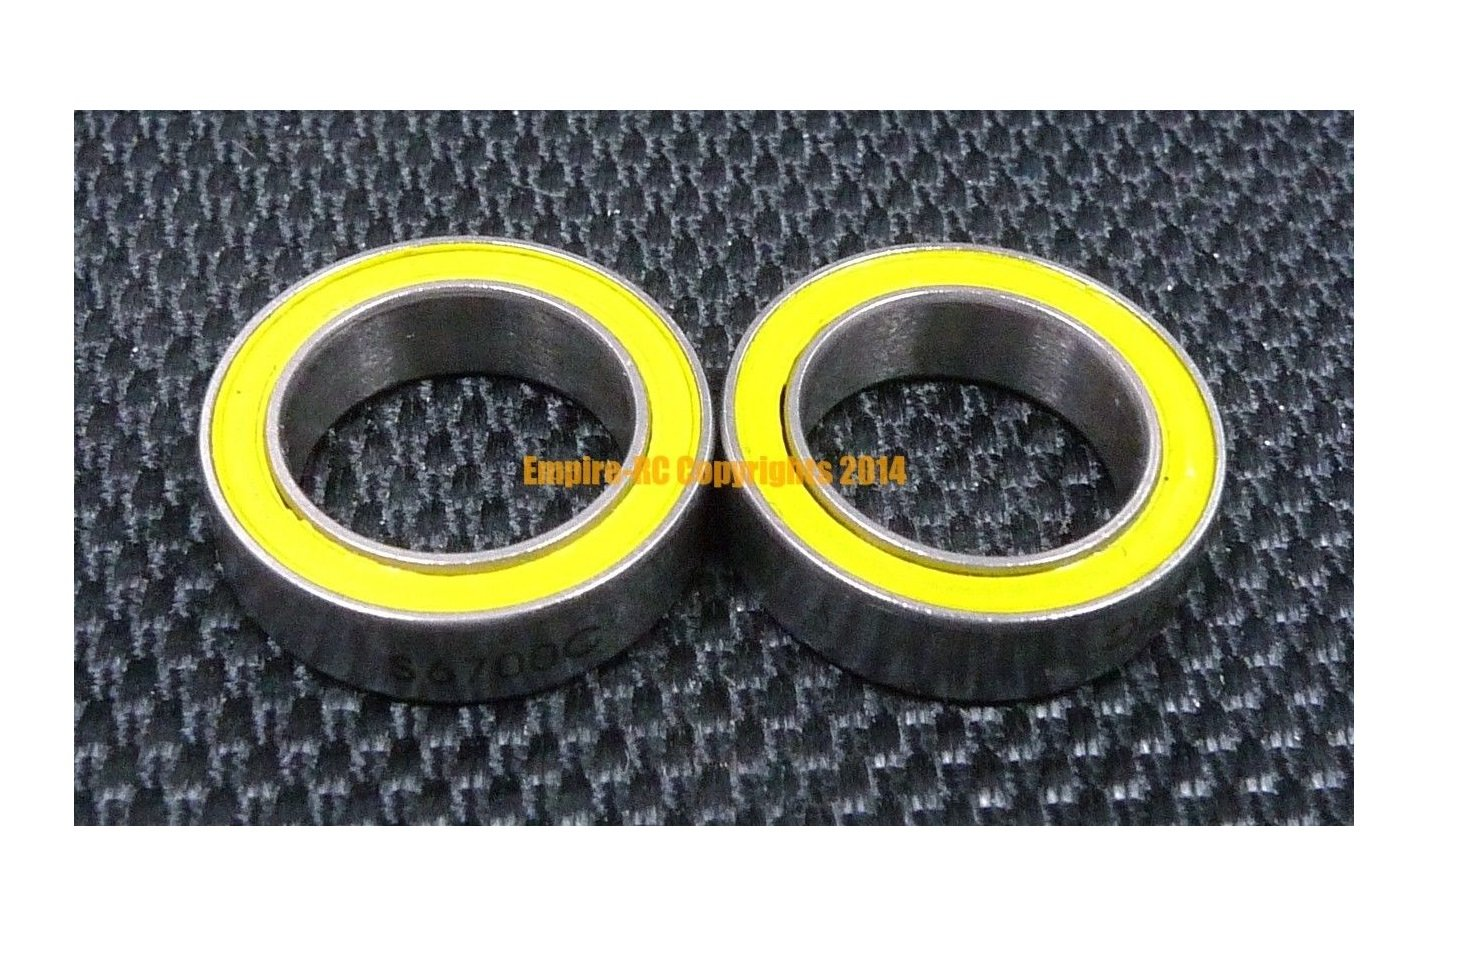 S6701-2RS 12x18x4 mm 5 PCS 440c Stainless Steel CERAMIC Ball Bearing ABEC-5